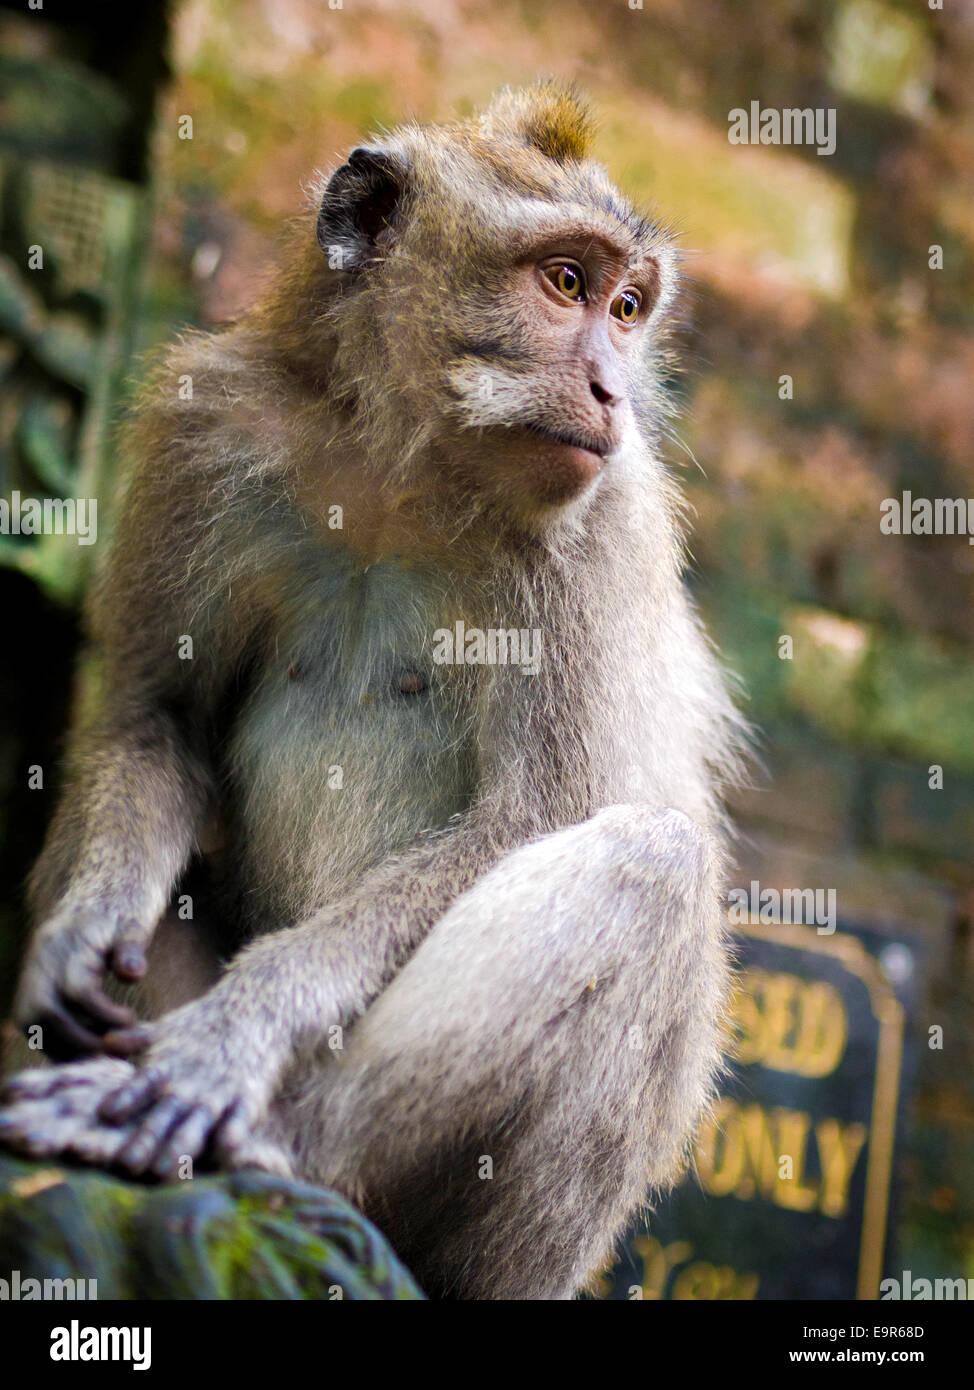 Rhesus monkey in the Monkey Forest Sanctuary in Ubud, Bali, Indonesia. - Stock Image